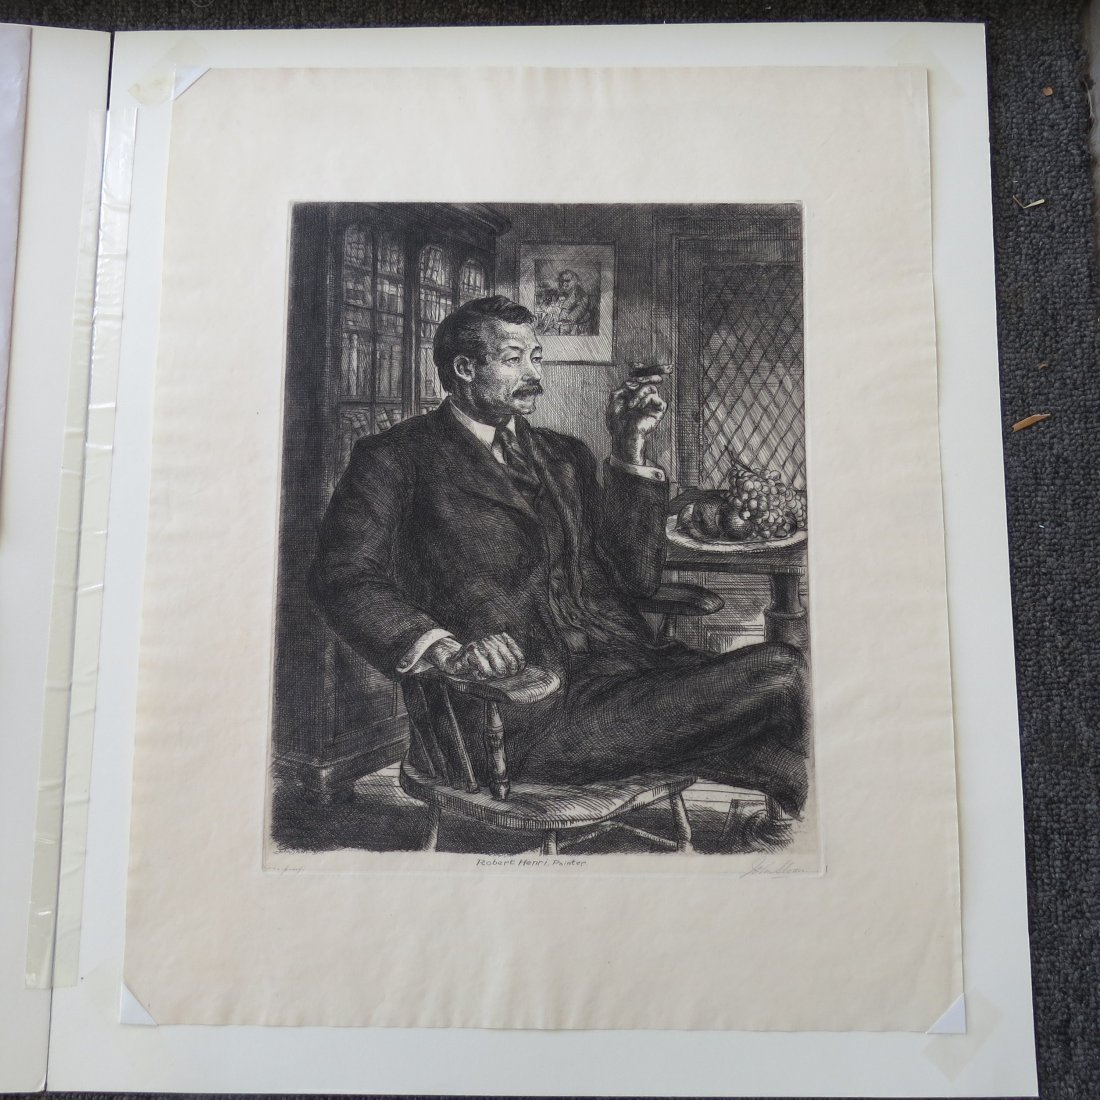 John Sloan (American, 1871-1951) Robert Henri, Painter. - 3